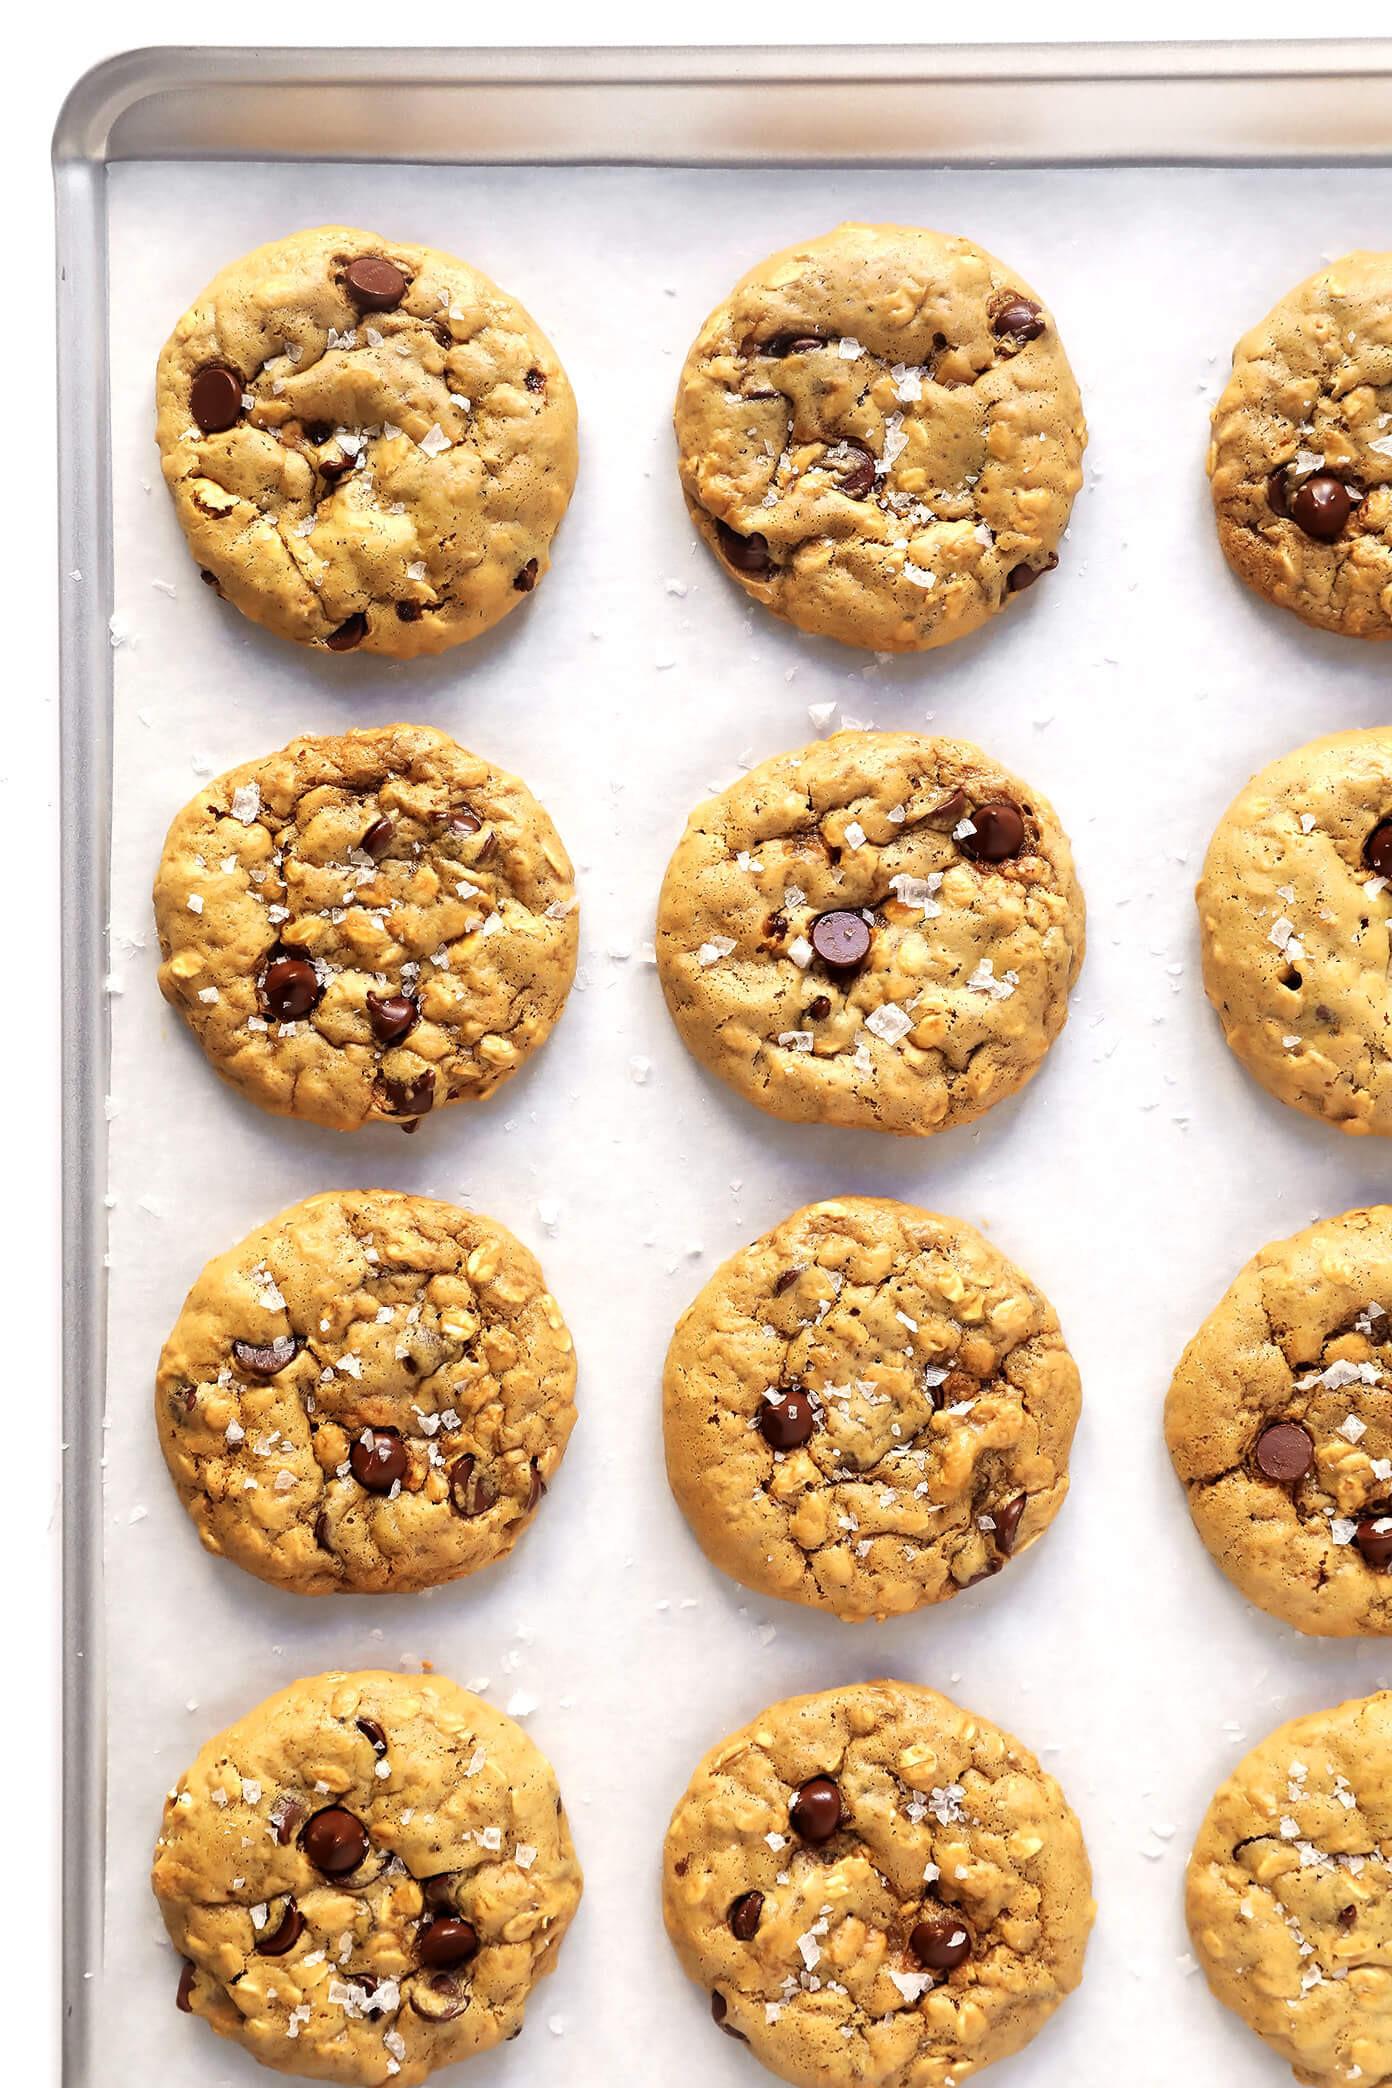 Peanut Butter Cookies Recipe Easy  Healthy Peanut Butter Cookies